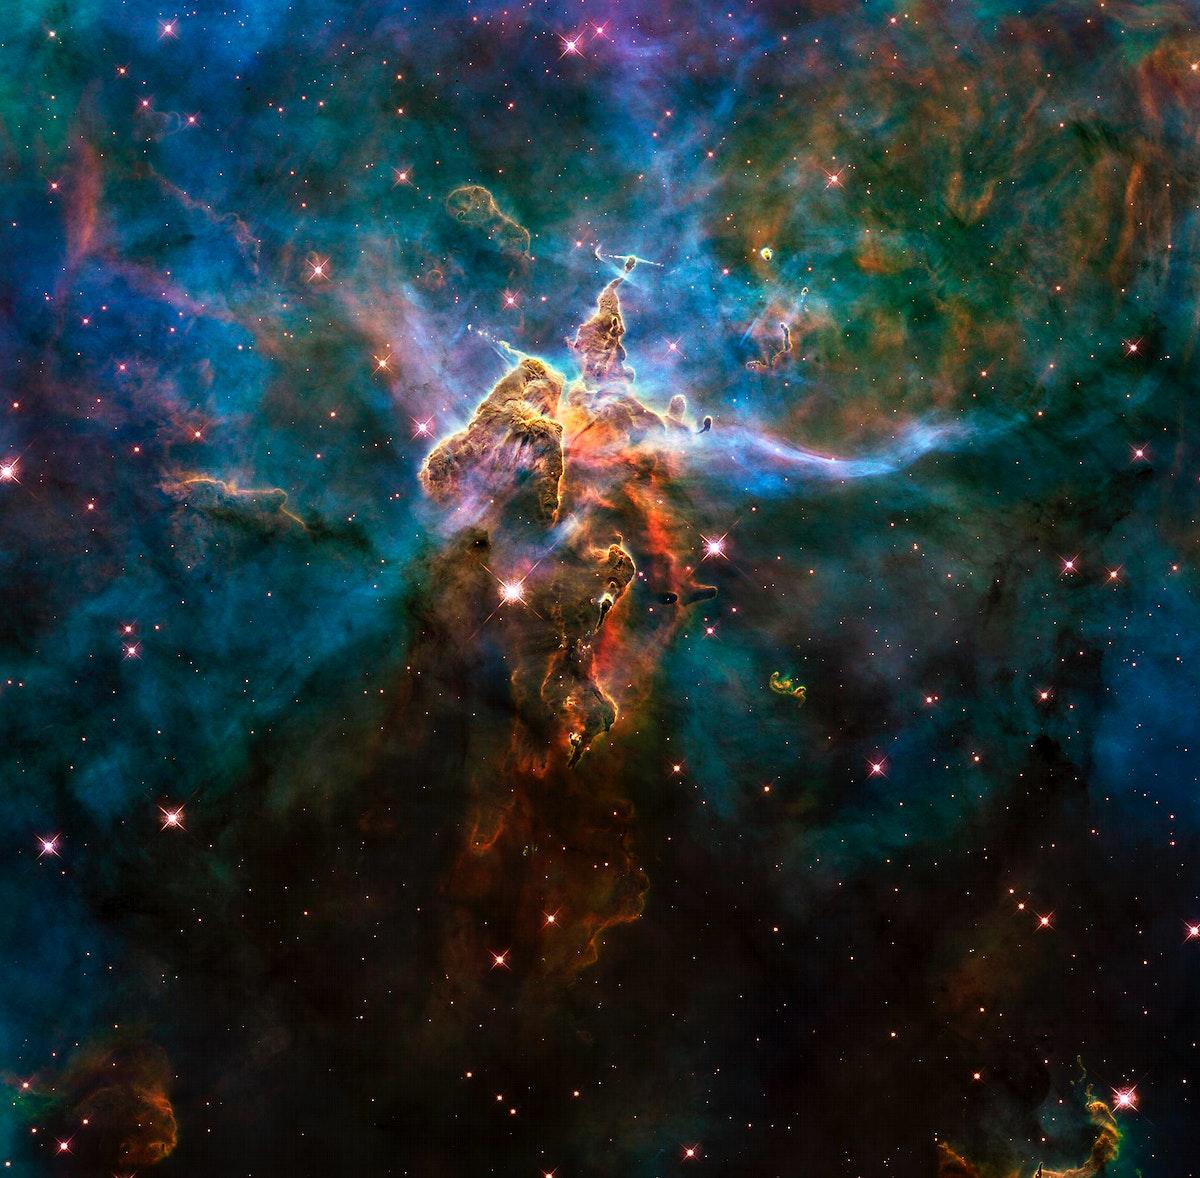 Image of a nebula taken using a NASA telescope - Original from NASA . Digitally enhanced by rawpixel.